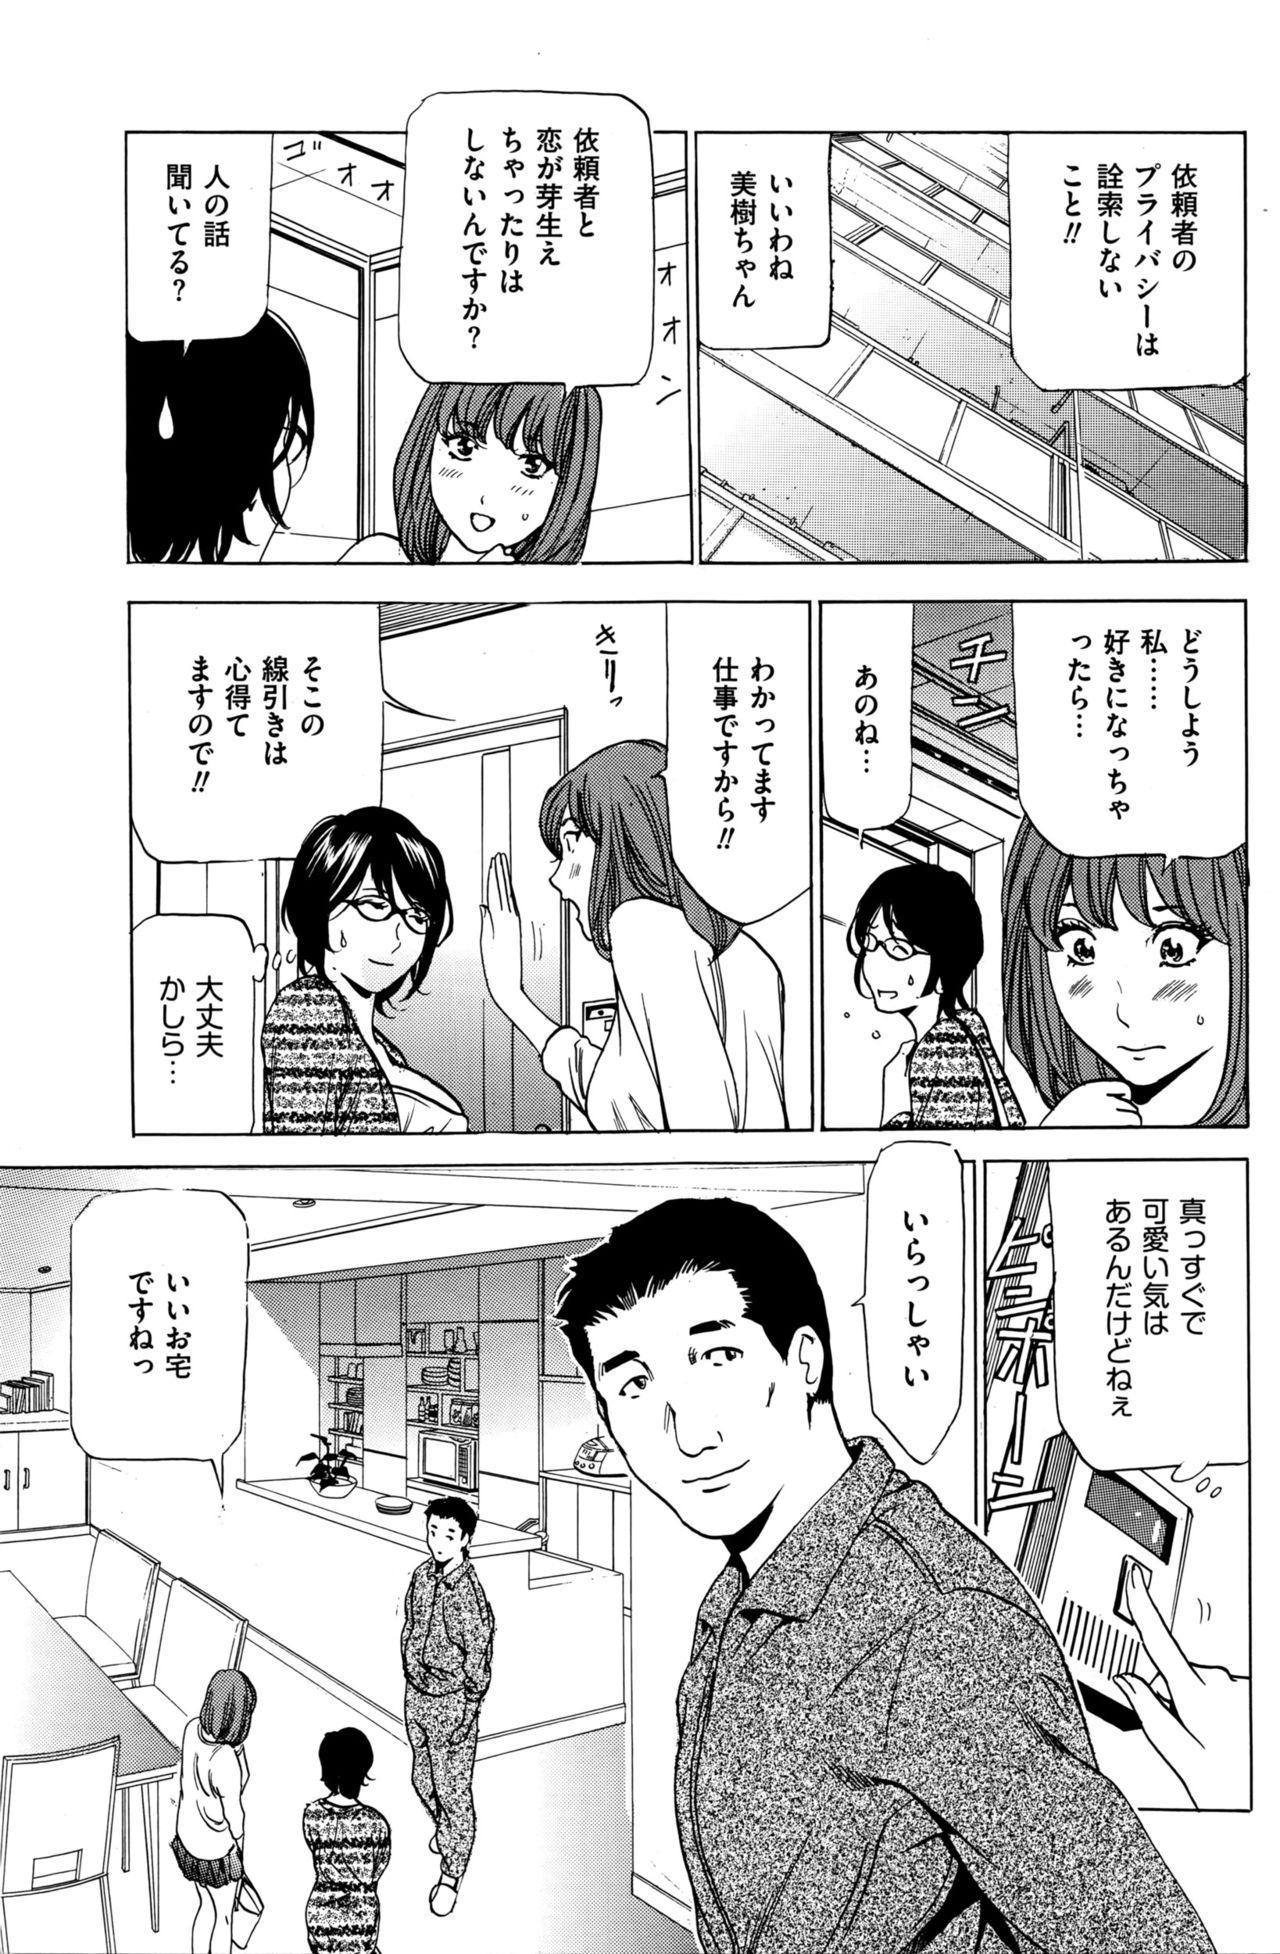 Wa Usuki Ipa a 1-10 39